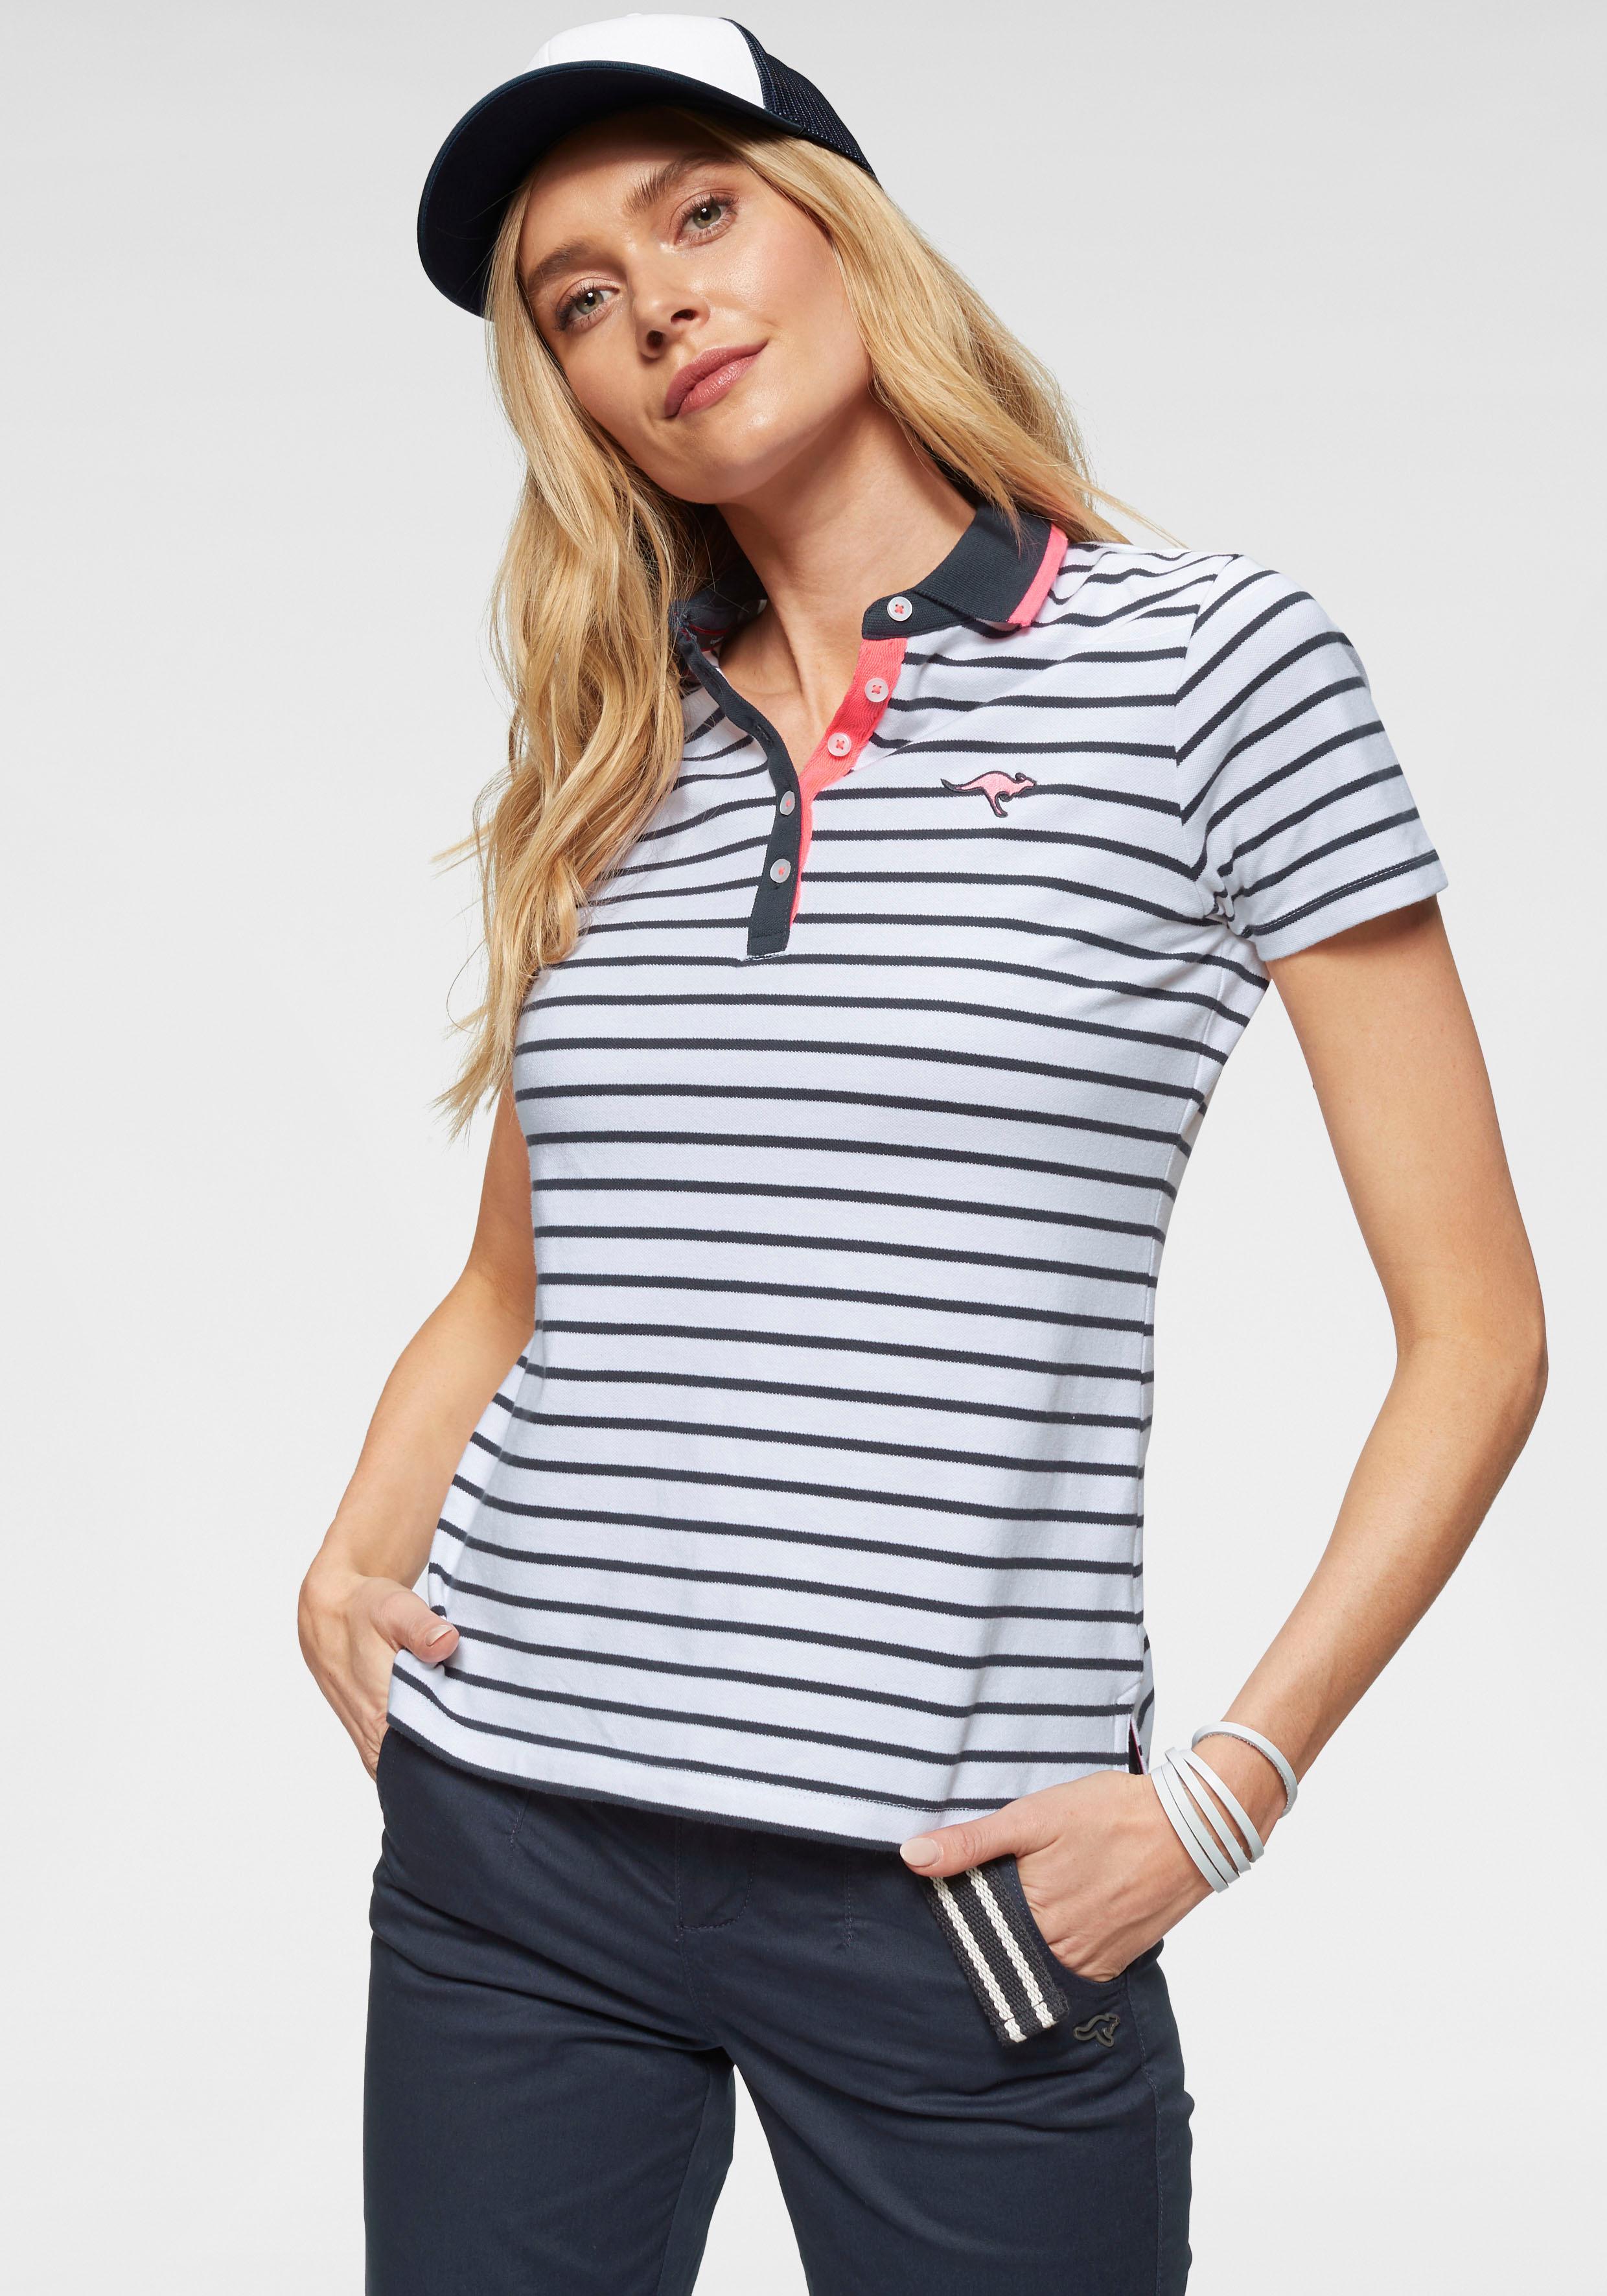 KangaROOS Poloshirt | Bekleidung > Shirts > Poloshirts | Weiß | Kangaroos